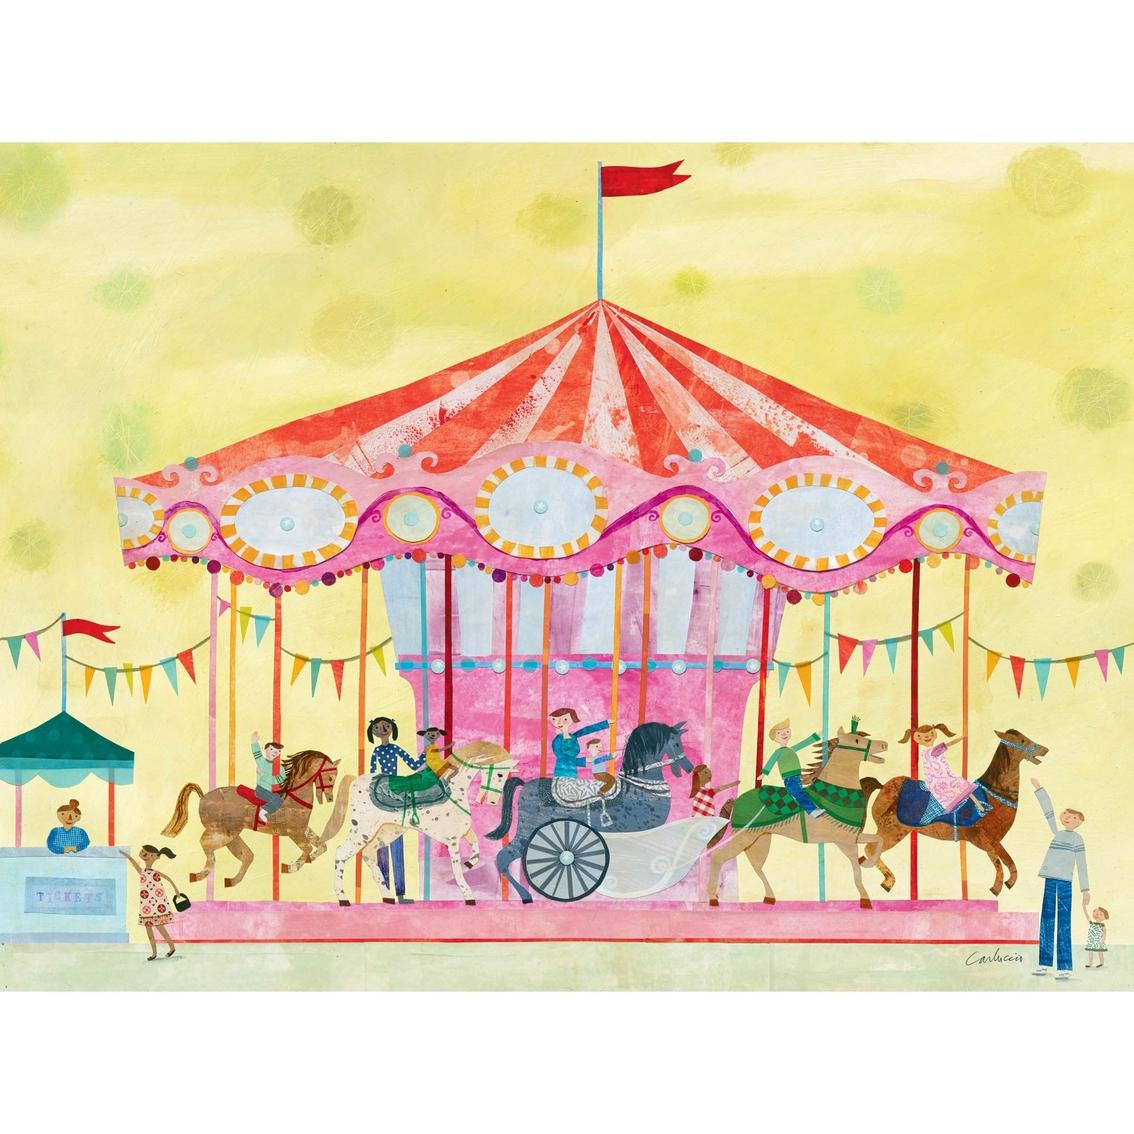 Greenbox Art 24 X 18 Carousel Canvas Wall Art | Wall Décor | Baby ...